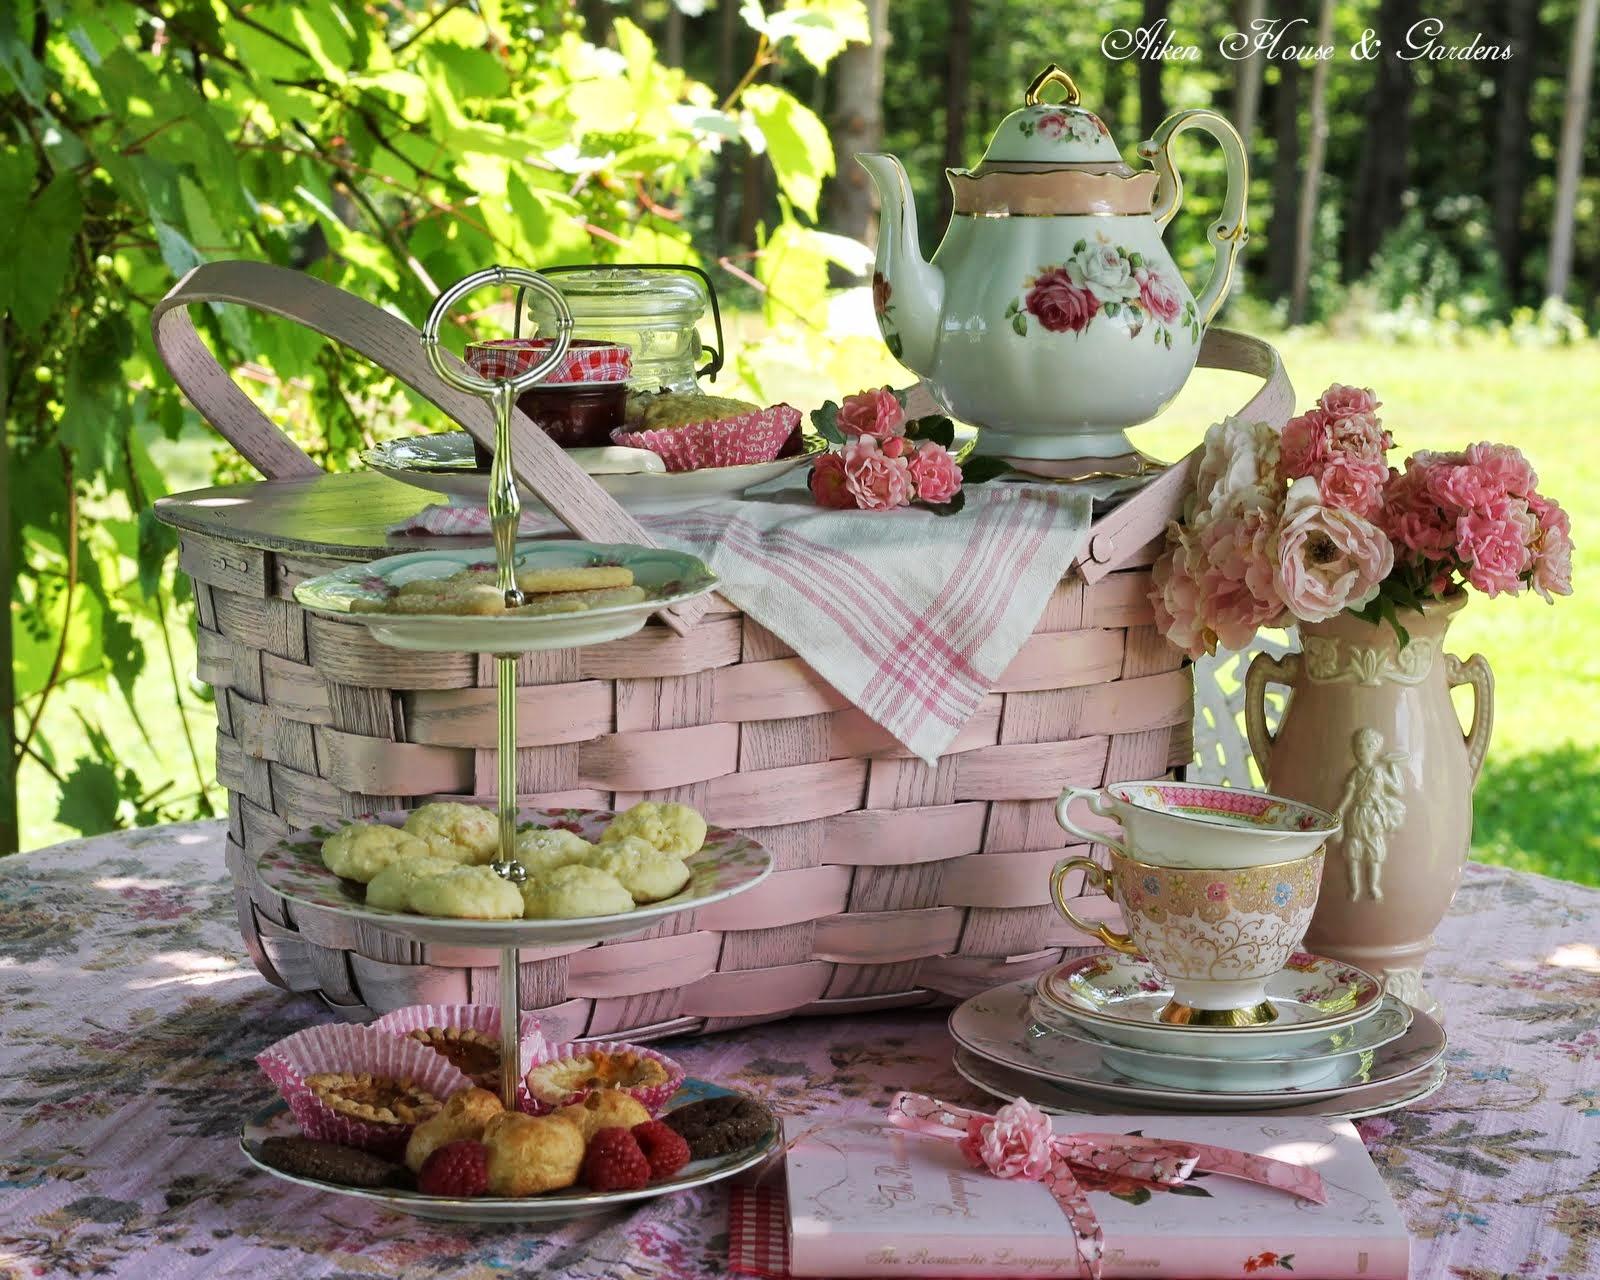 aiken house gardens a summer pink picnic. Black Bedroom Furniture Sets. Home Design Ideas